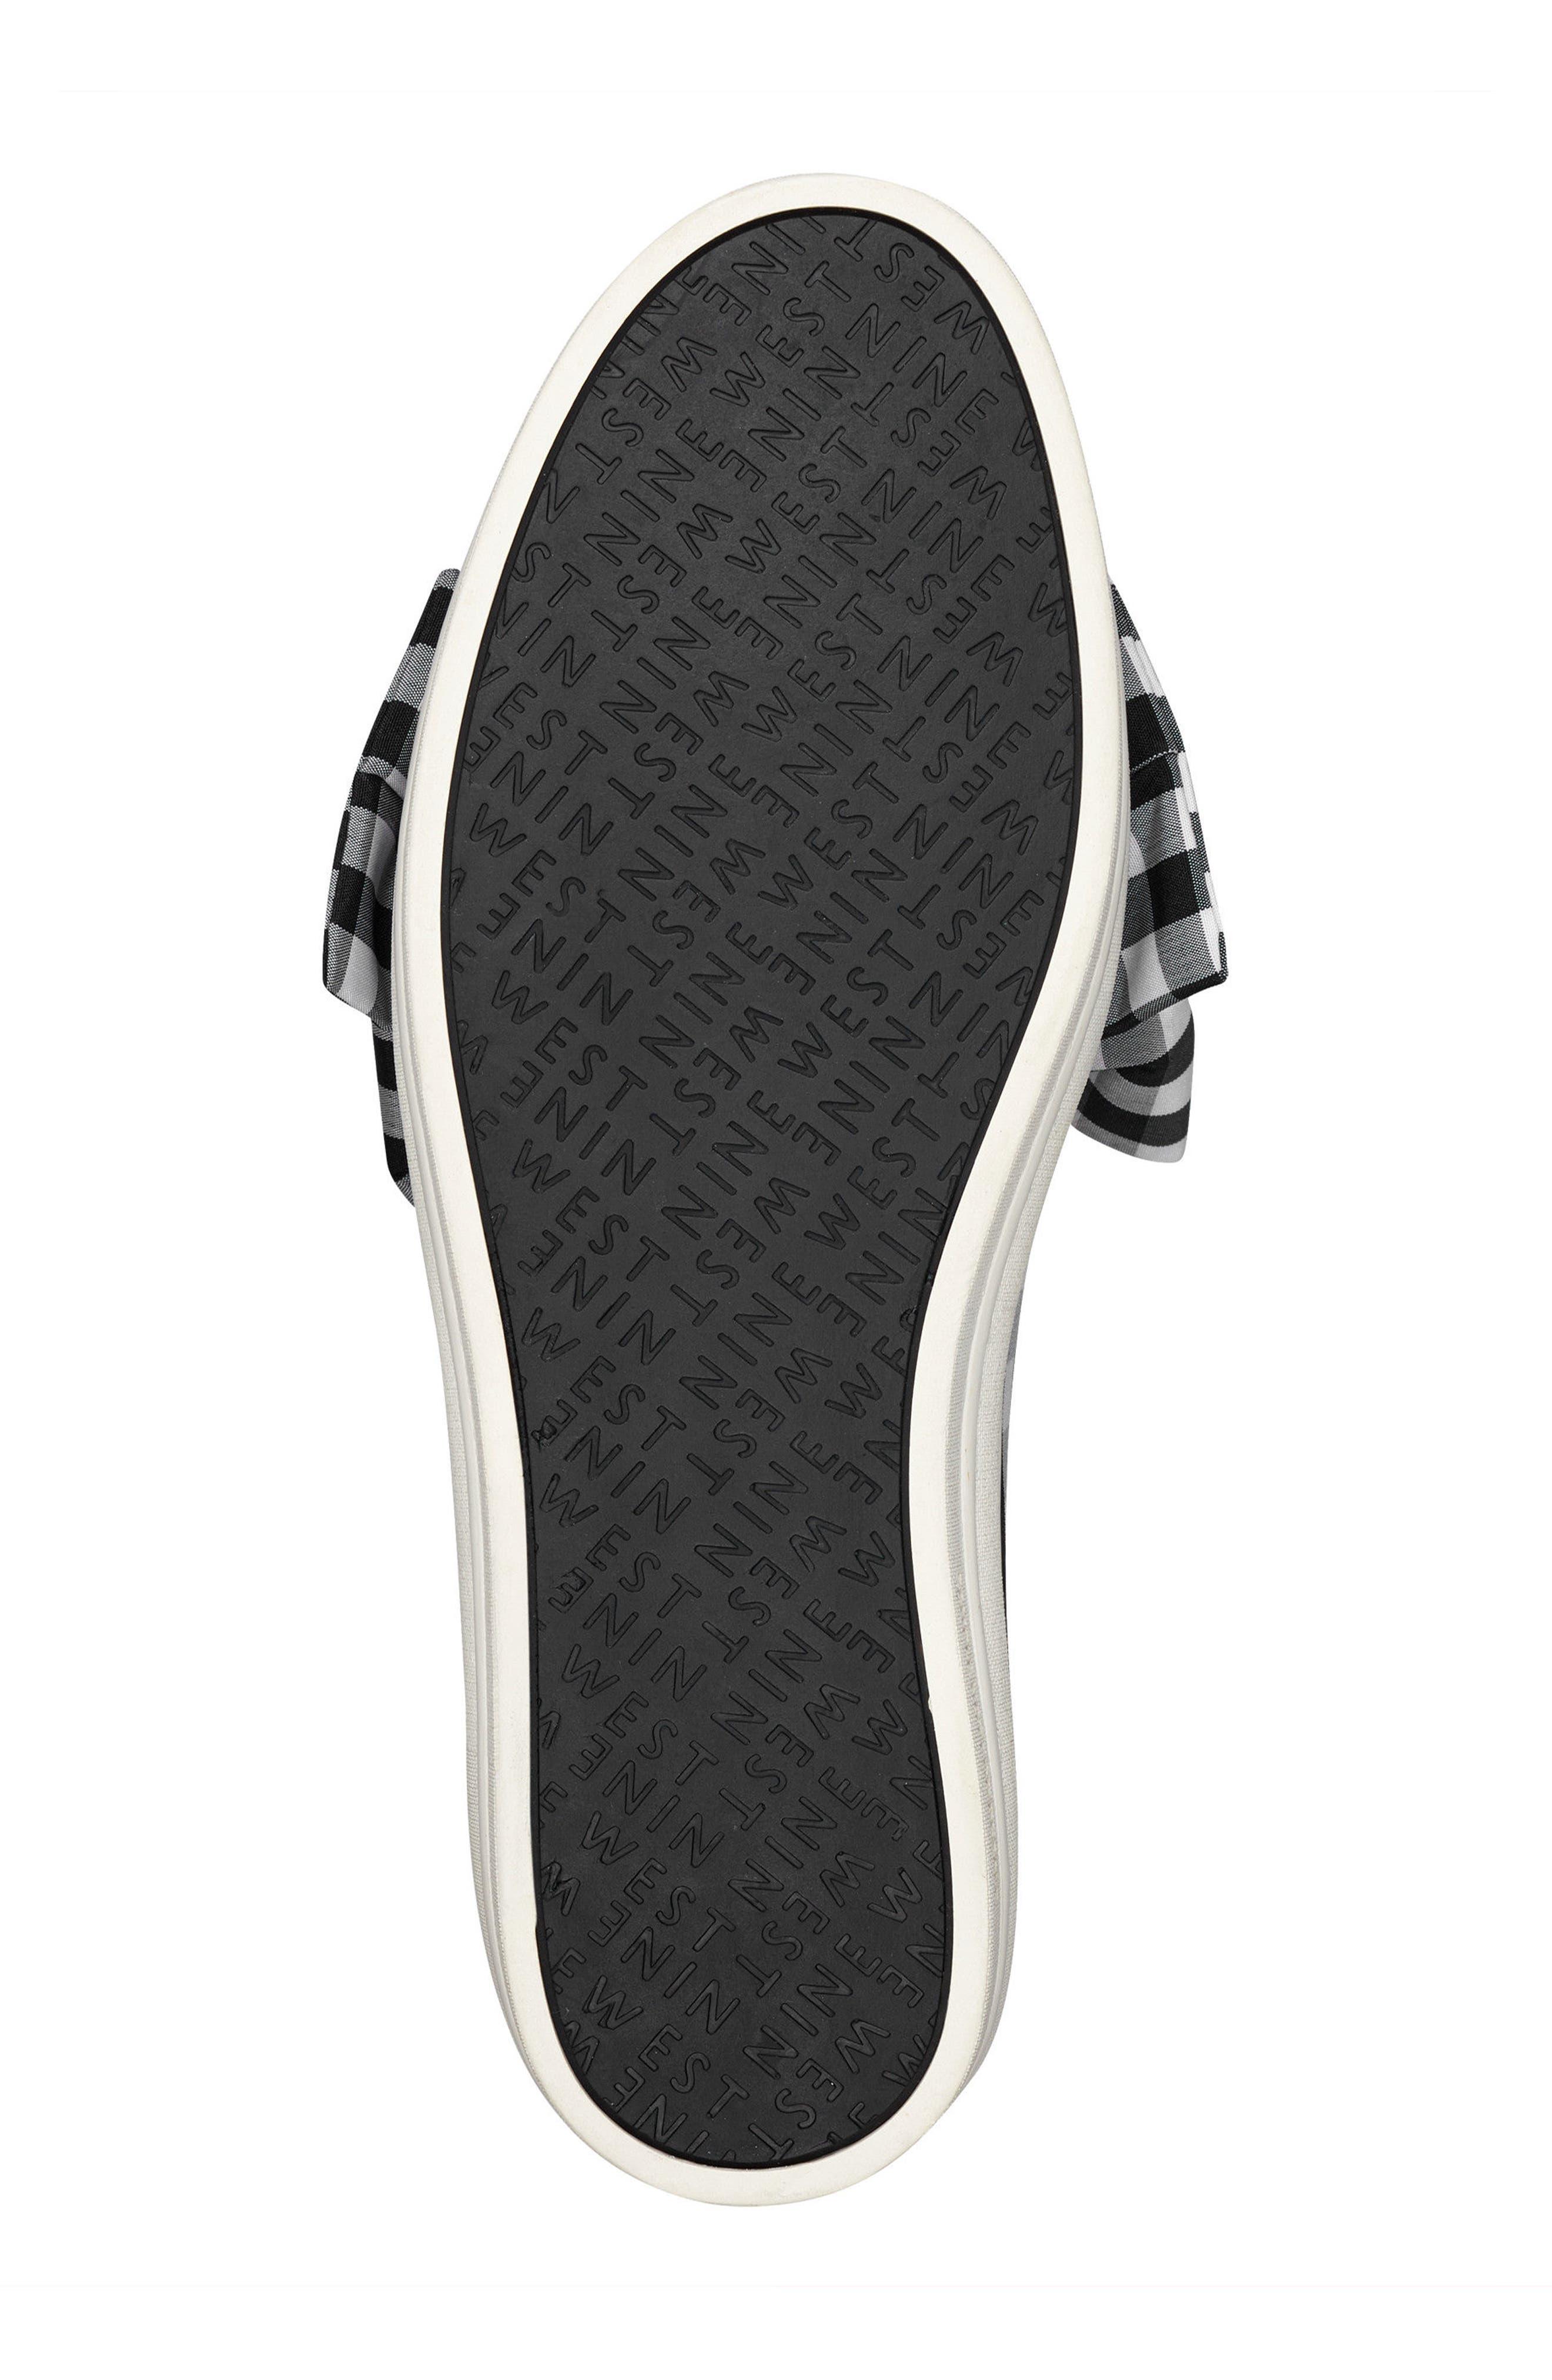 Onosha Bow Slip-On Sneaker,                             Alternate thumbnail 6, color,                             Black/ White Fabric